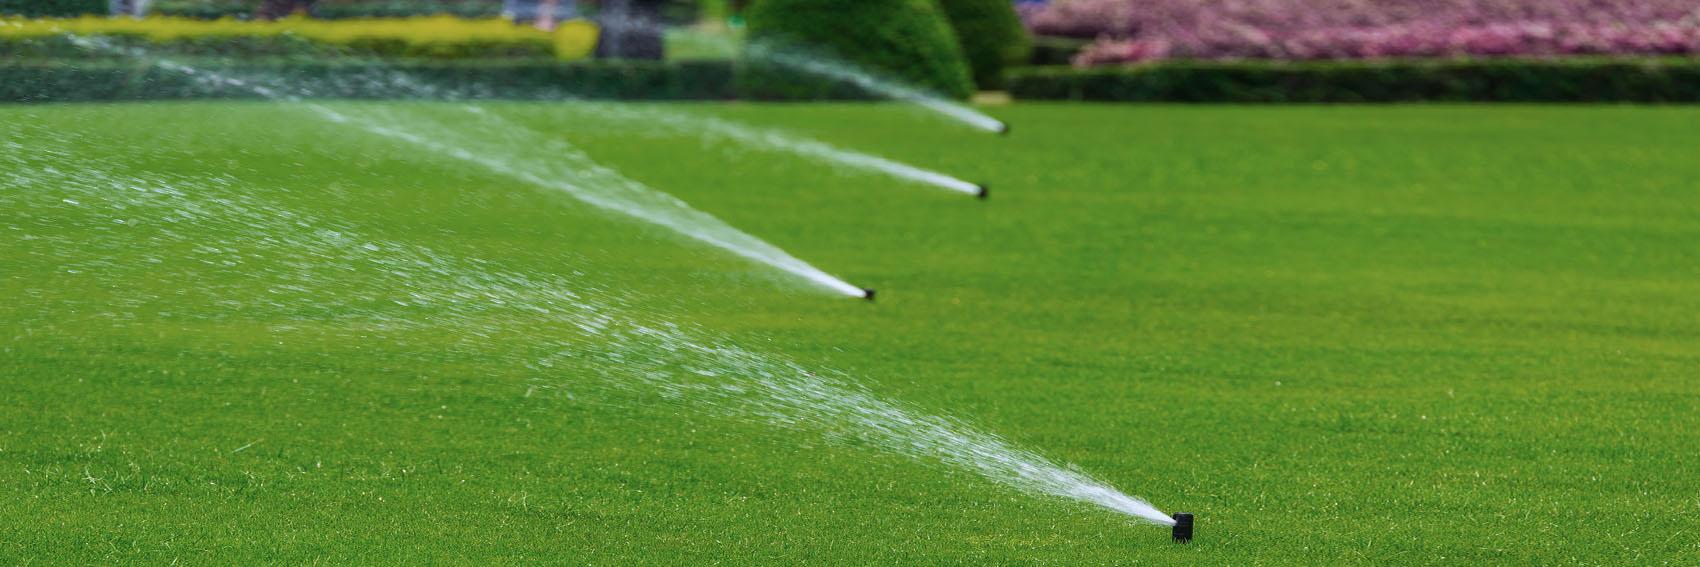 dallas irrigation service